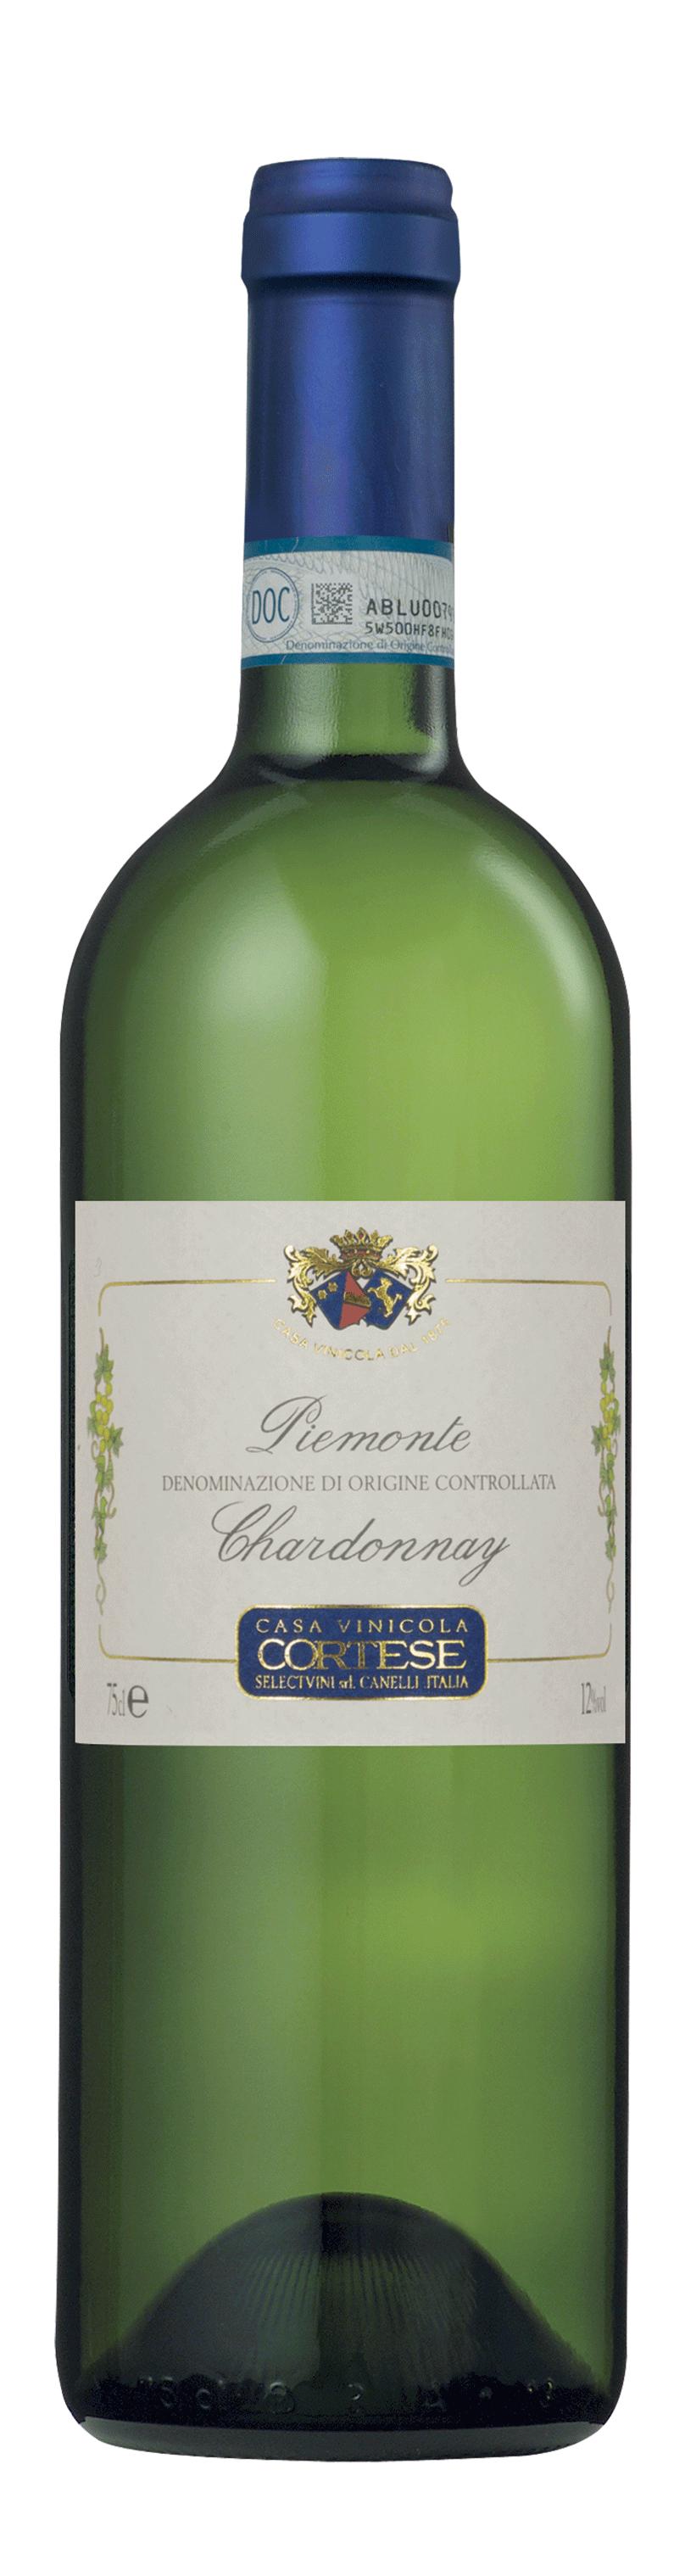 ChardonnayPiem-cortese